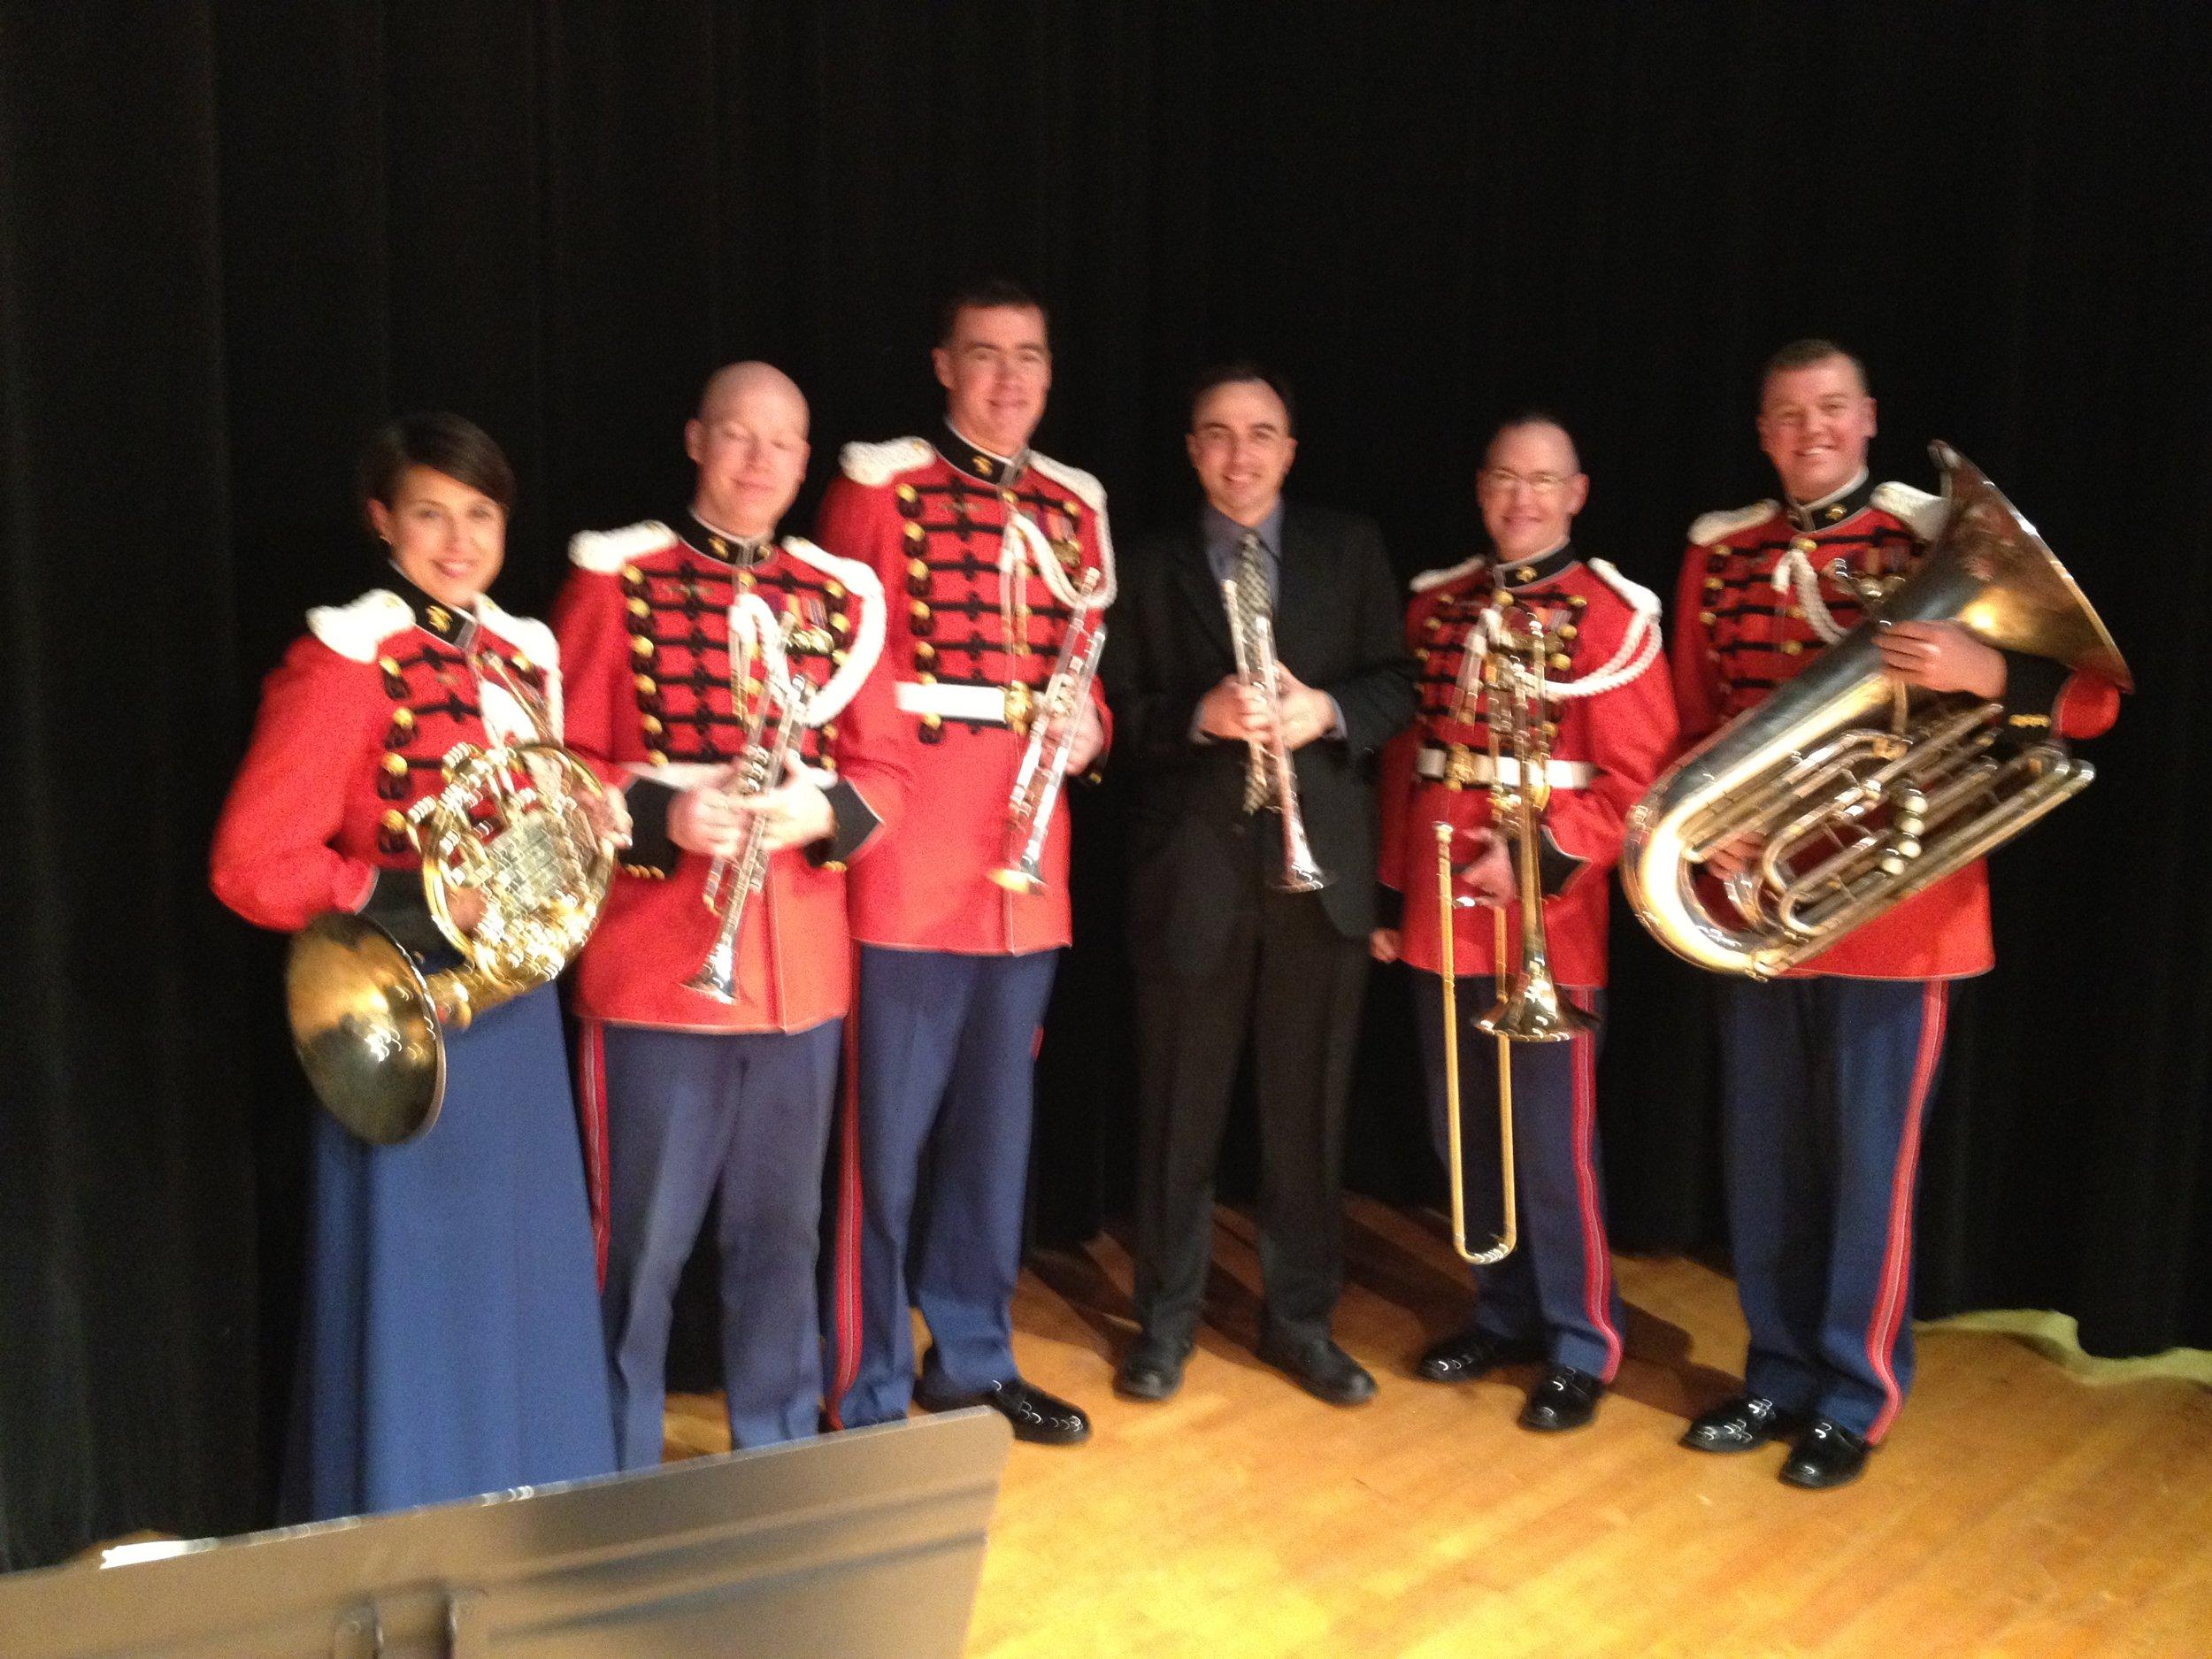 President's Own Marine Band Brass Quintet